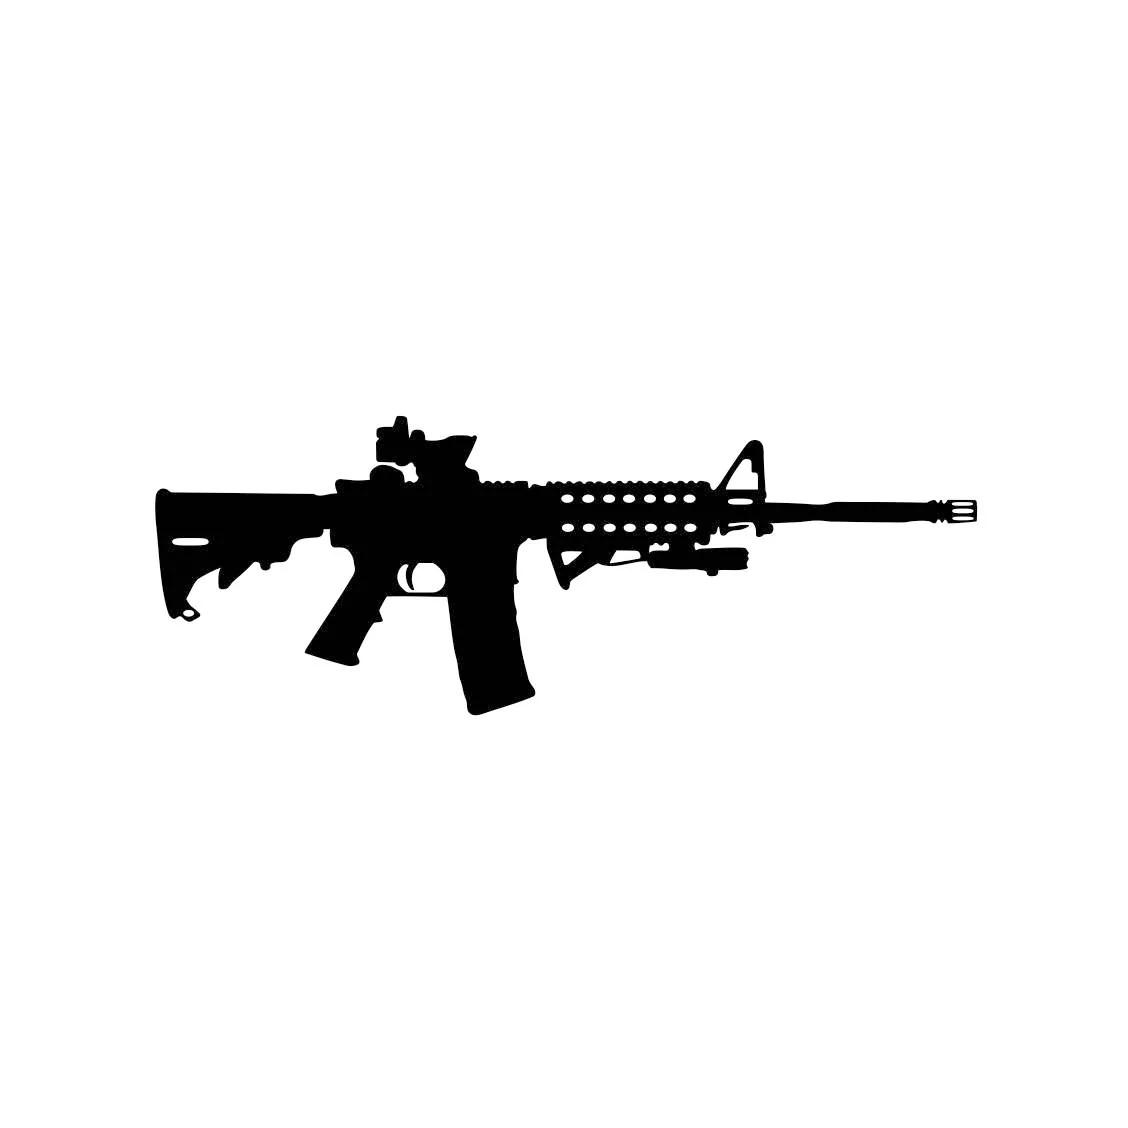 Gun Ammo Assault Rifle Graphics Svg Dxf Eps Cdr Ai